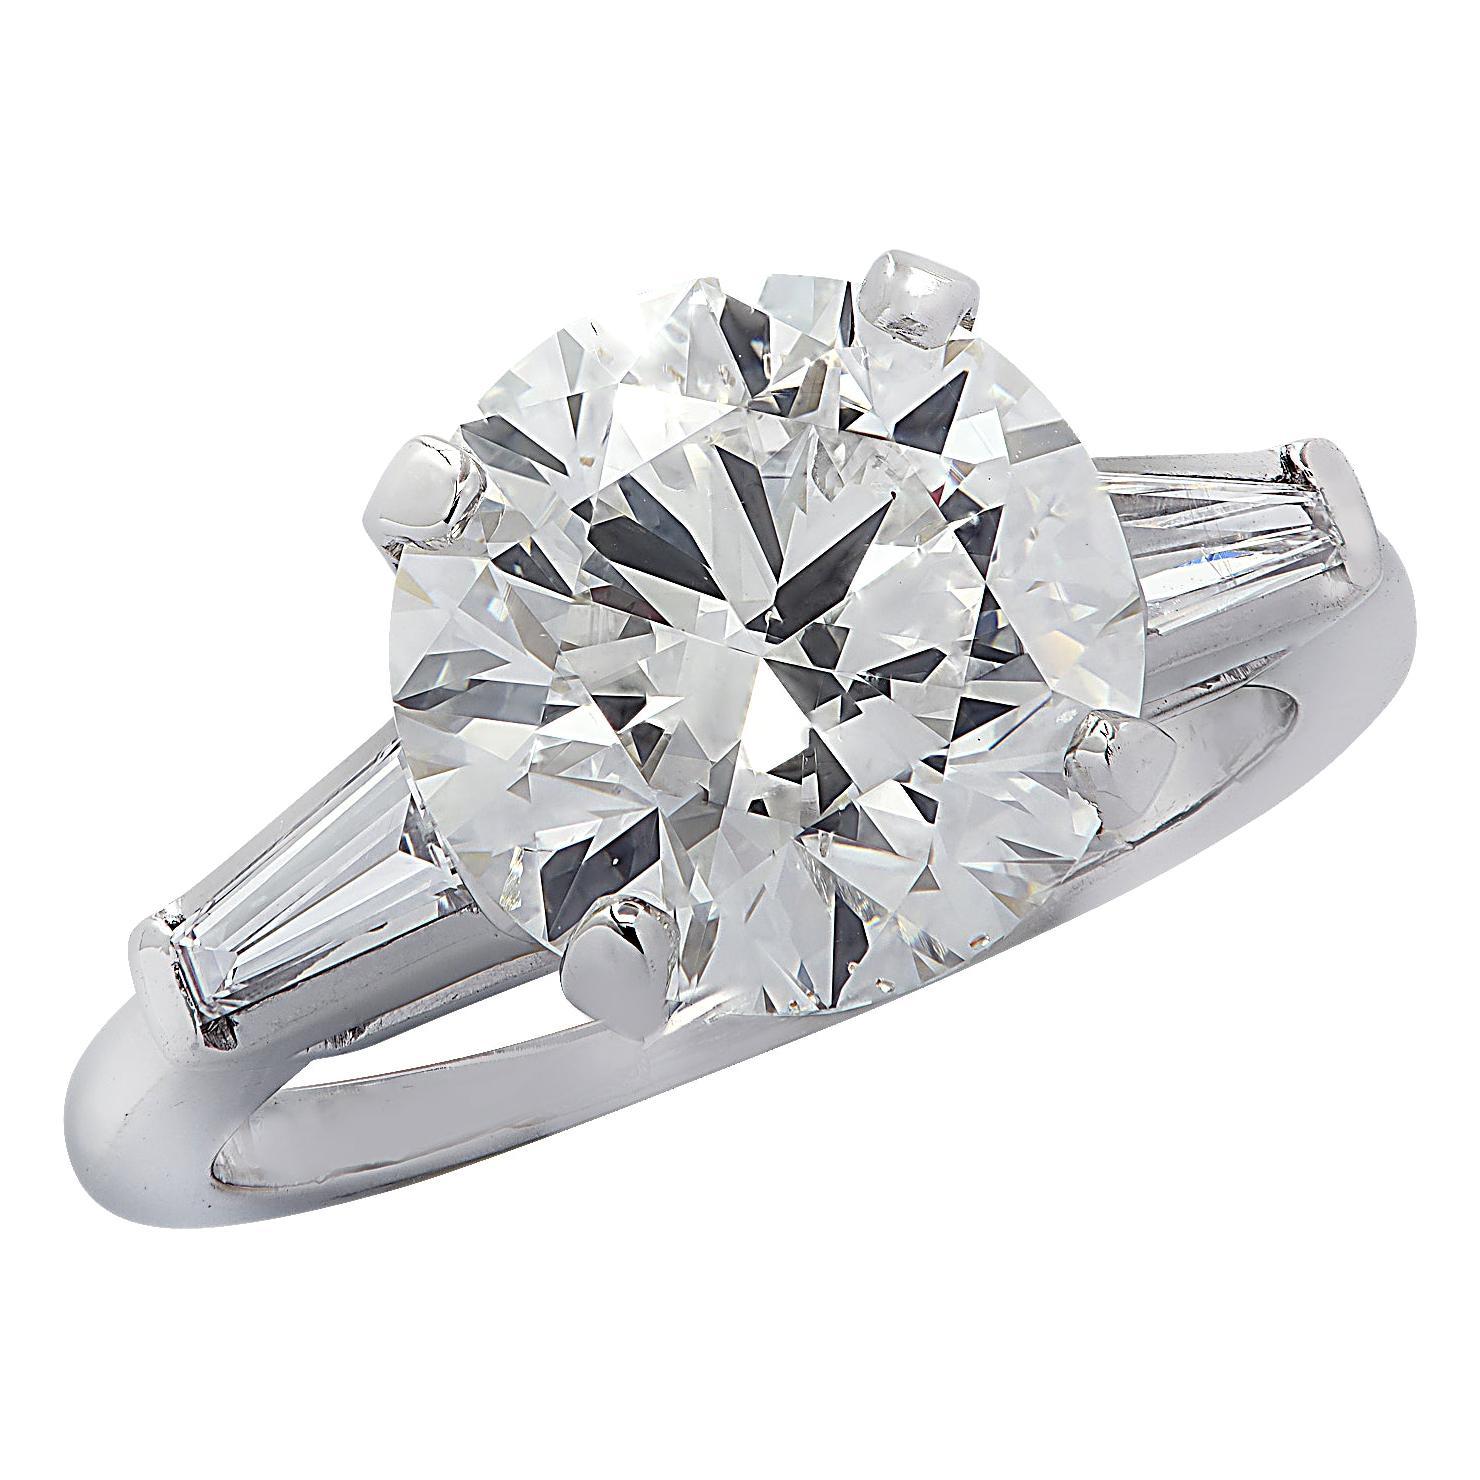 Vivid Diamonds GIA Certified 3.92 Carat Diamond Engagement Ring